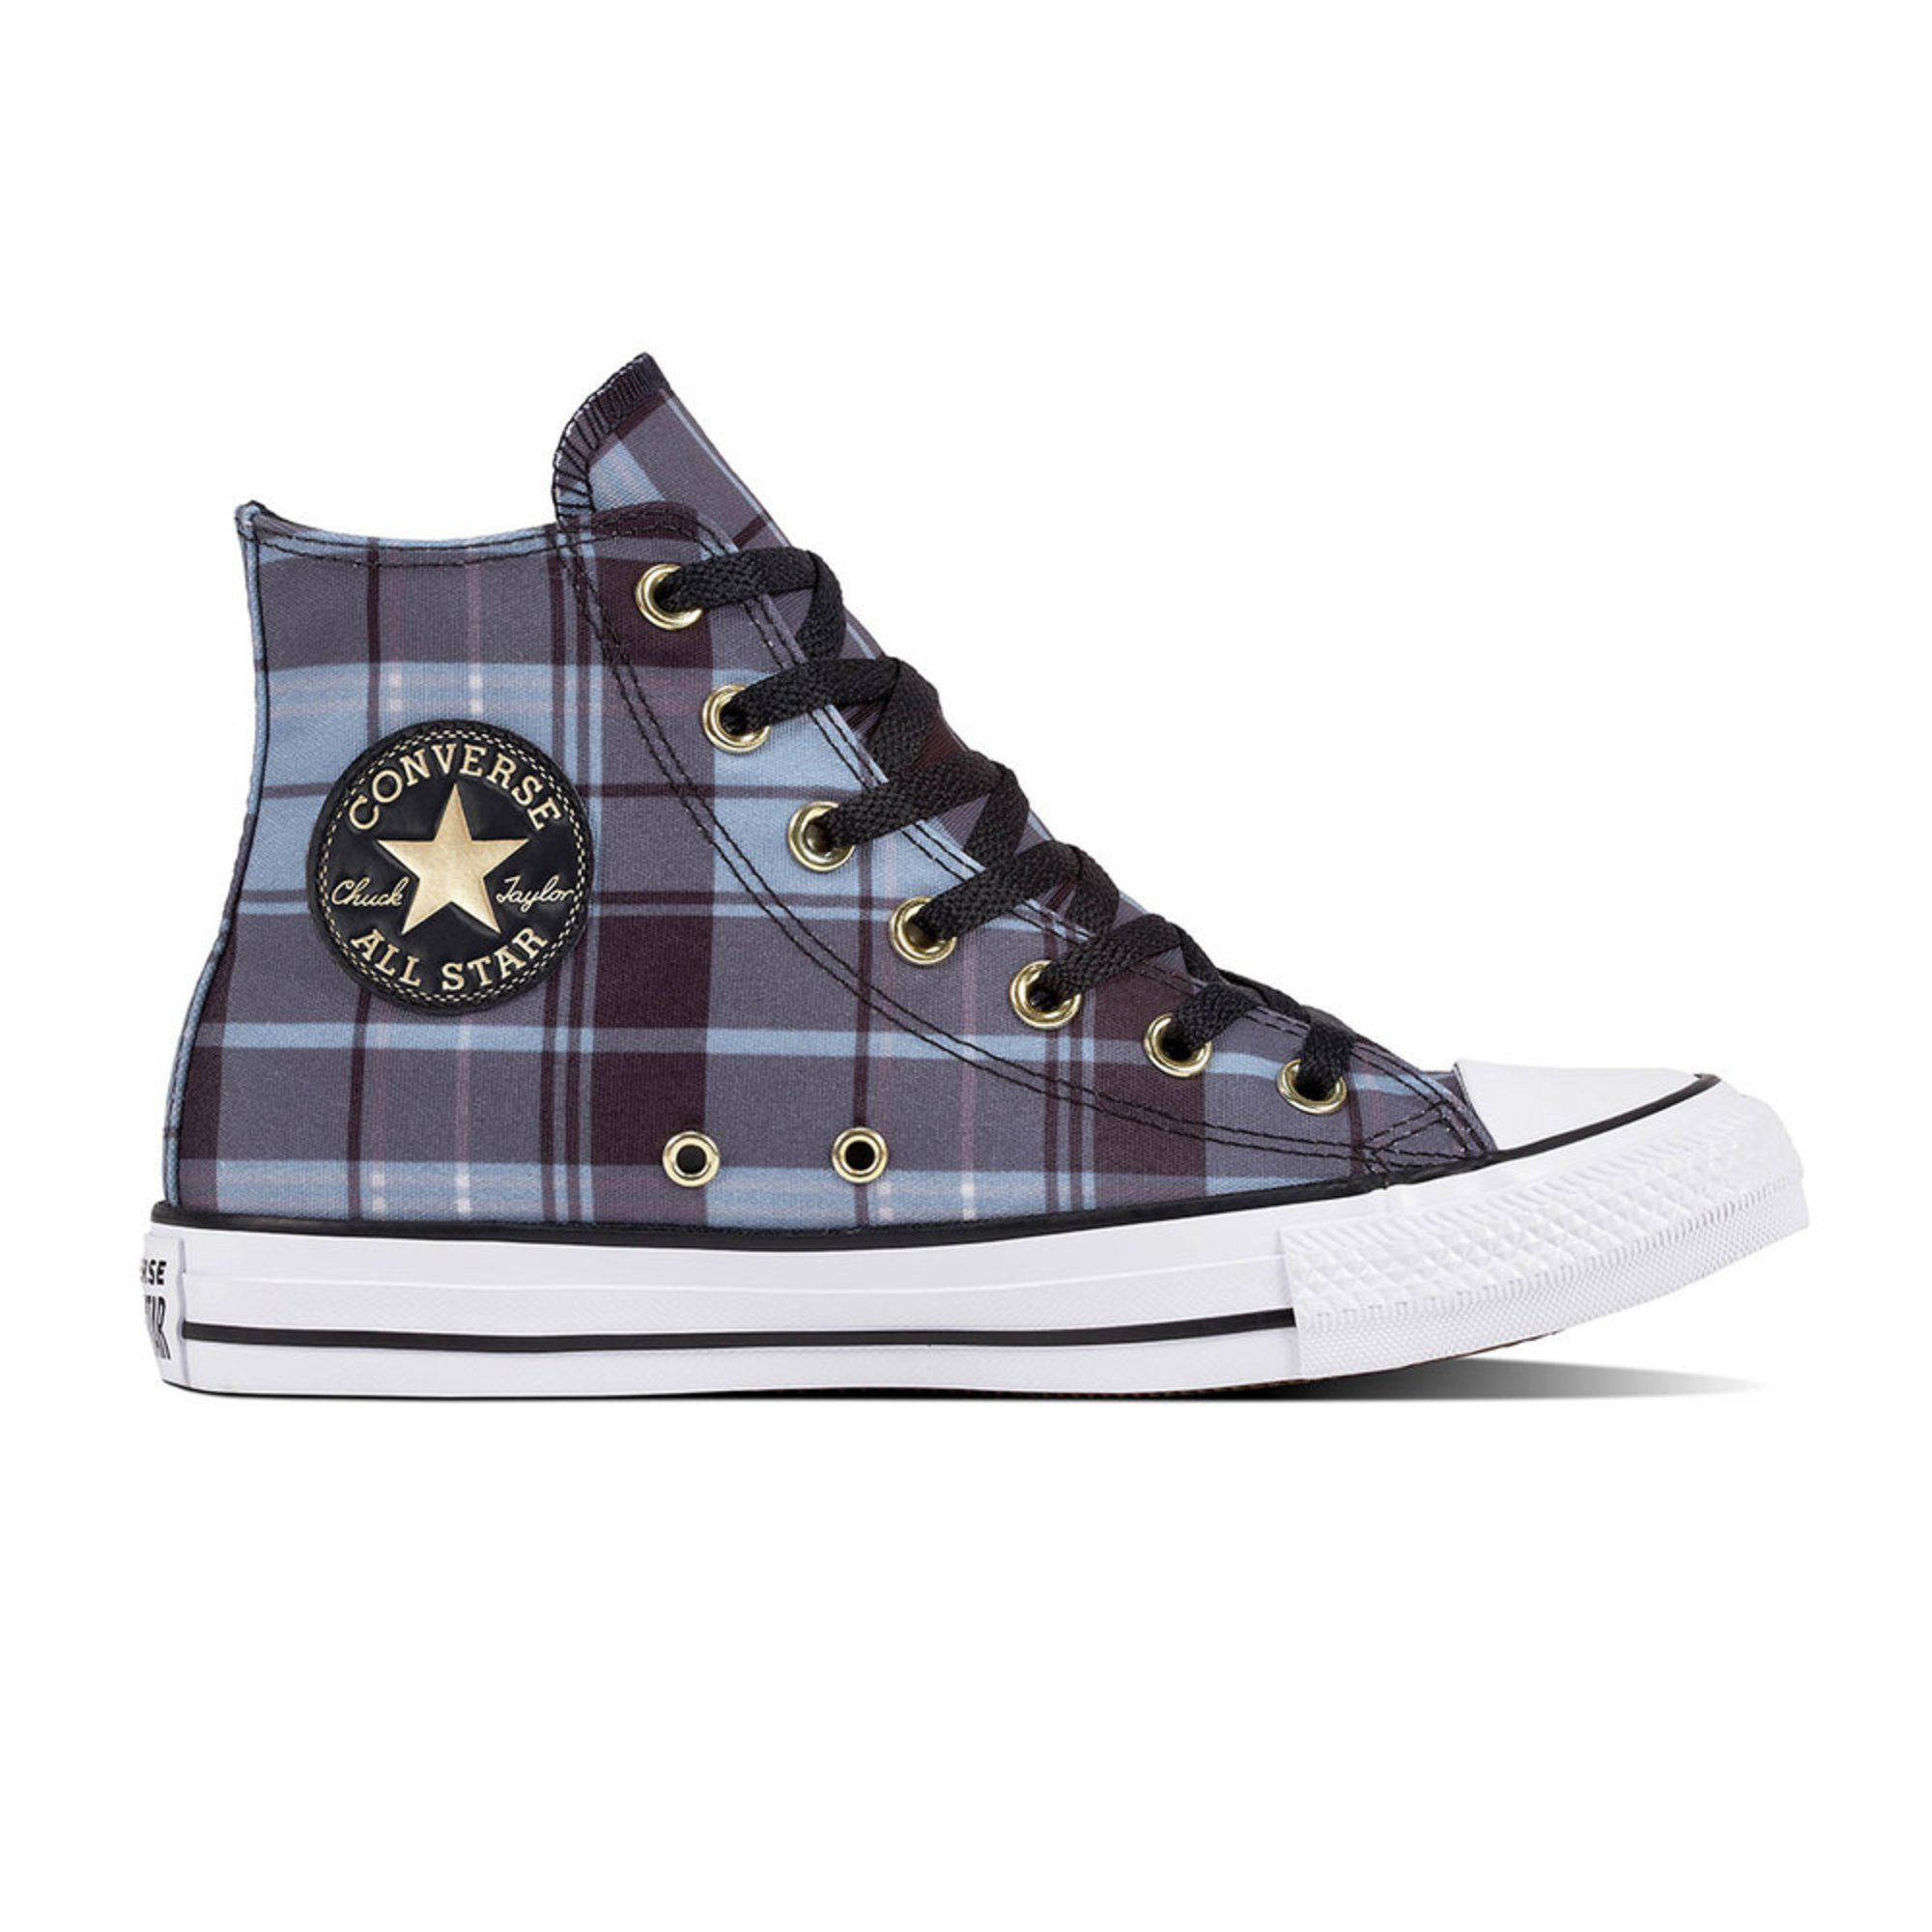 ce37c890f9a Converse. Converse Women s Chuck Taylor All Star Hi Top Sneaker